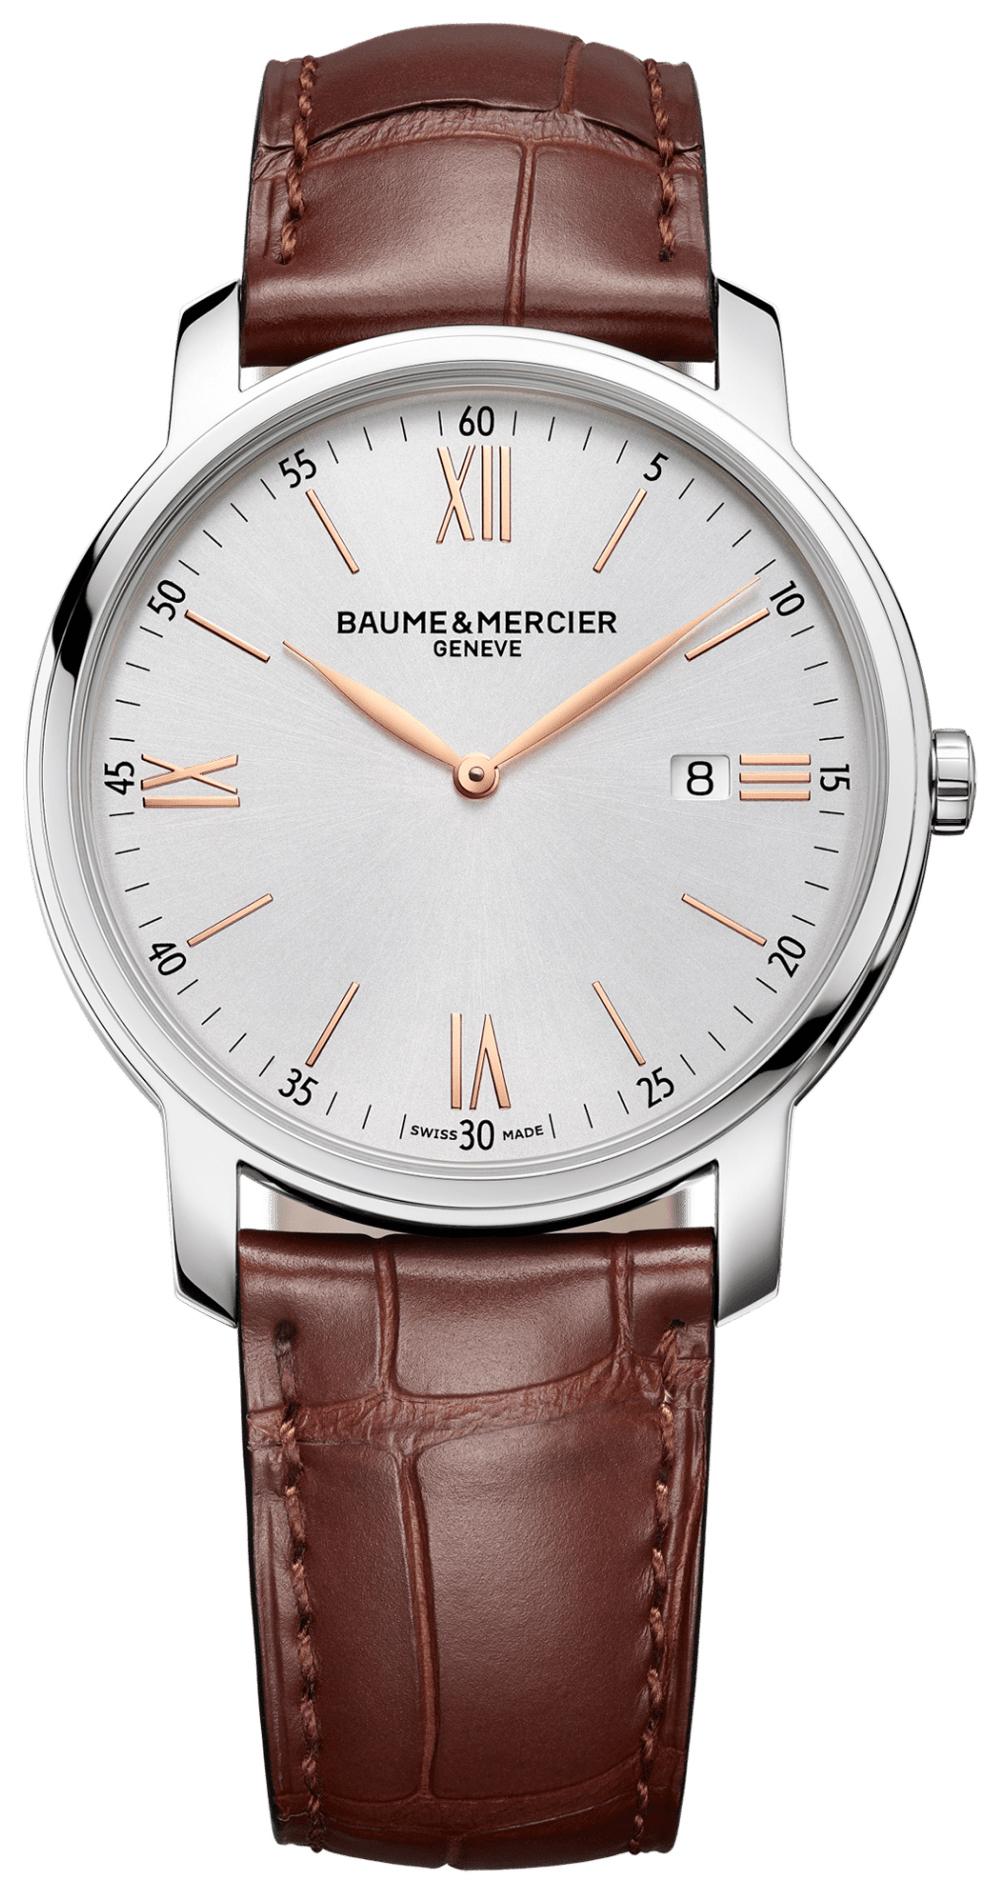 Baume & Mercier Classima Herrklocka M0A10380 Silverfärgad/Läder Ø42 - Baume & Mercier